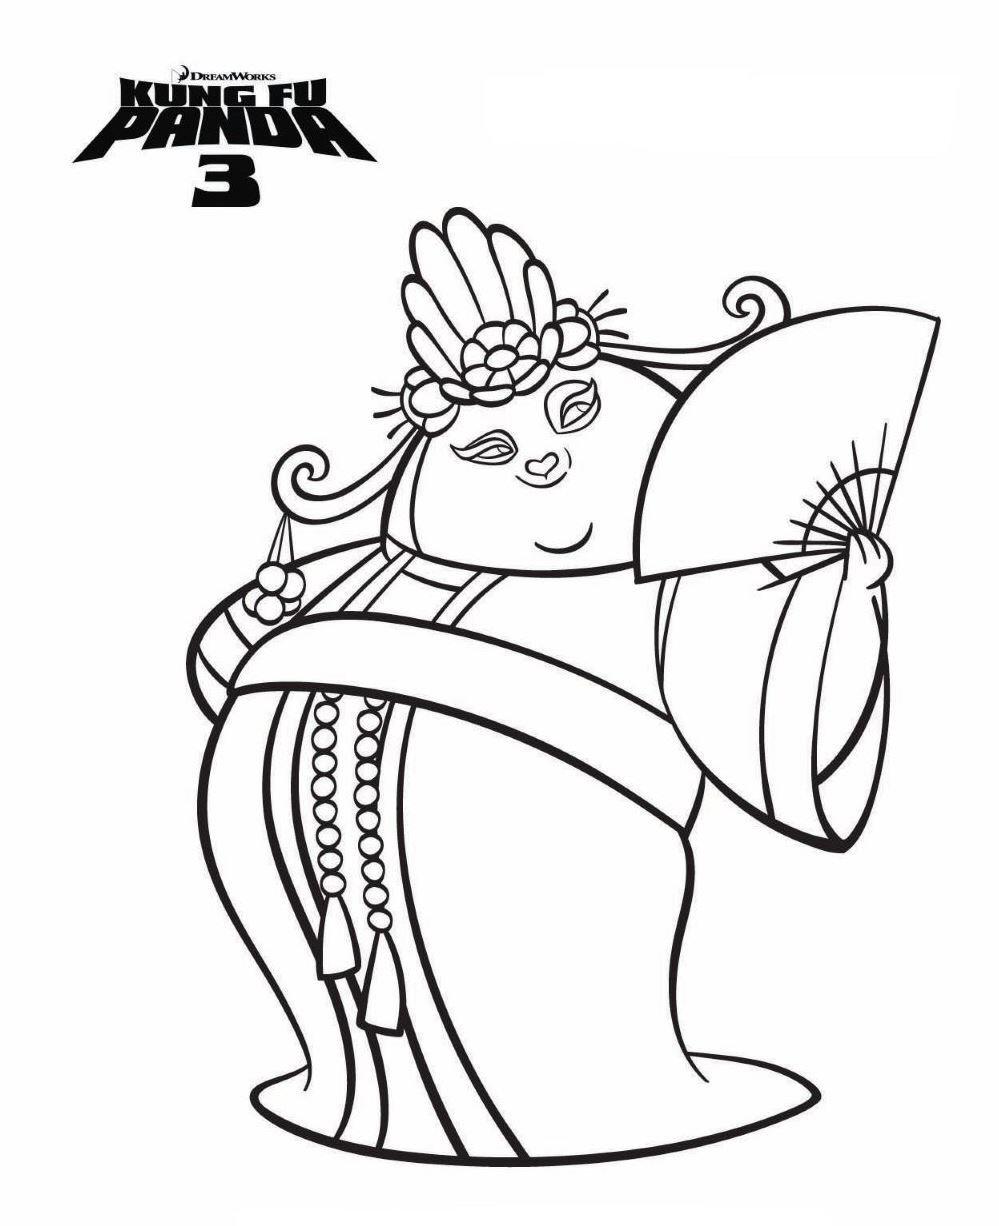 Kung fu panda 3 Ausmalbilder | Animaatjes.de